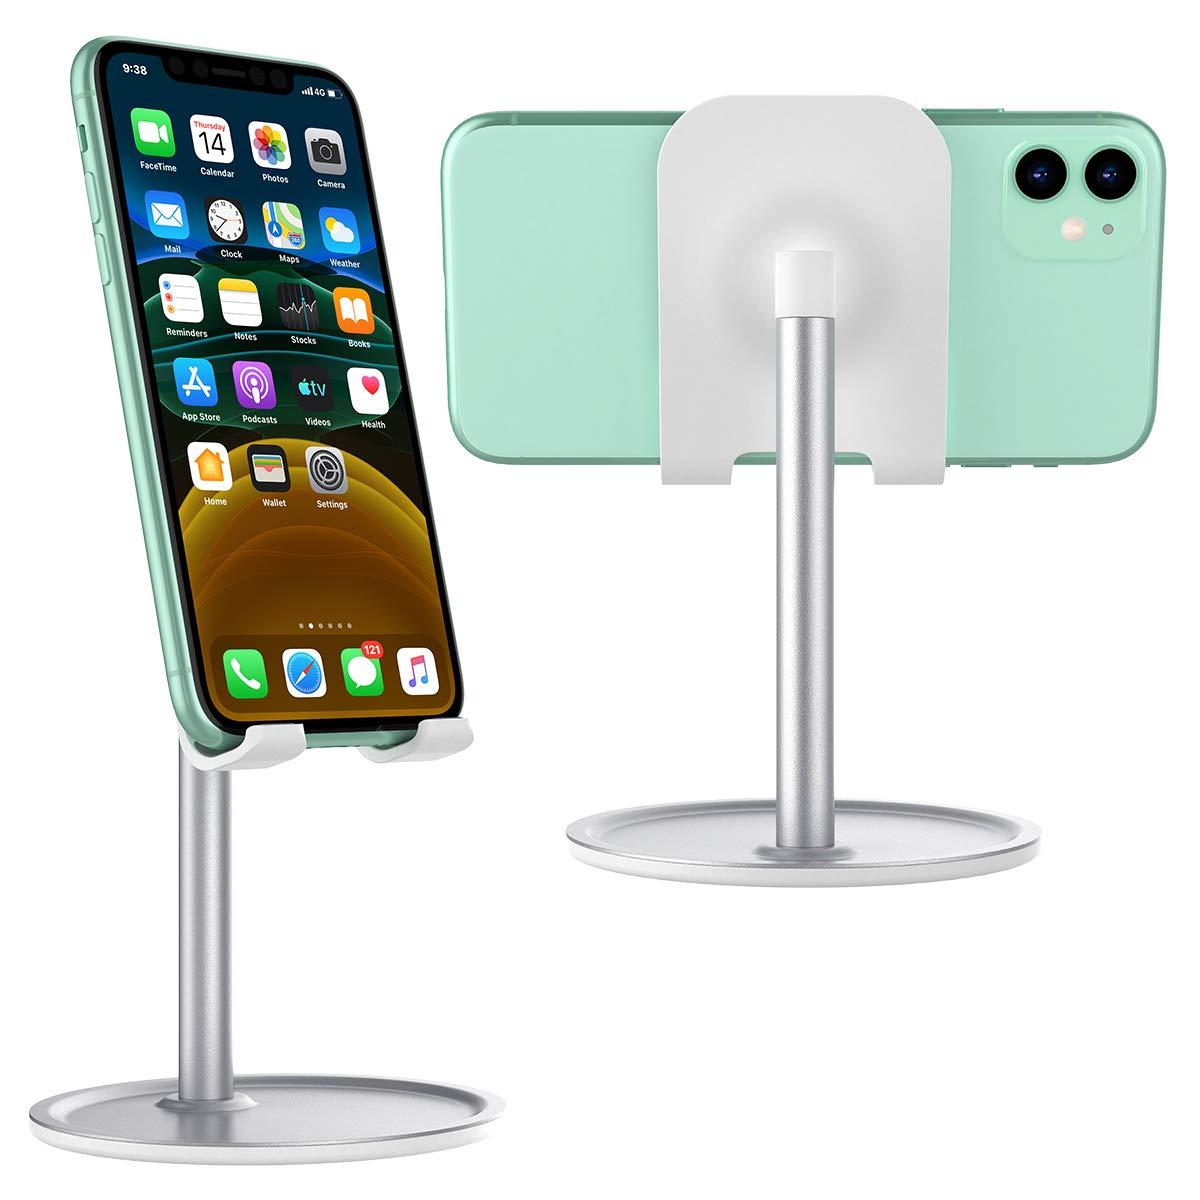 Huawei P30 P20 2019 iPad Pro,iPad Air,iPad Mini Supgear Handy St/änder Samsung S10 S9 Universal Verstellbarem Betrachtungswinkel Handy Halterung f/ür iPhone 11 pro XS XR X